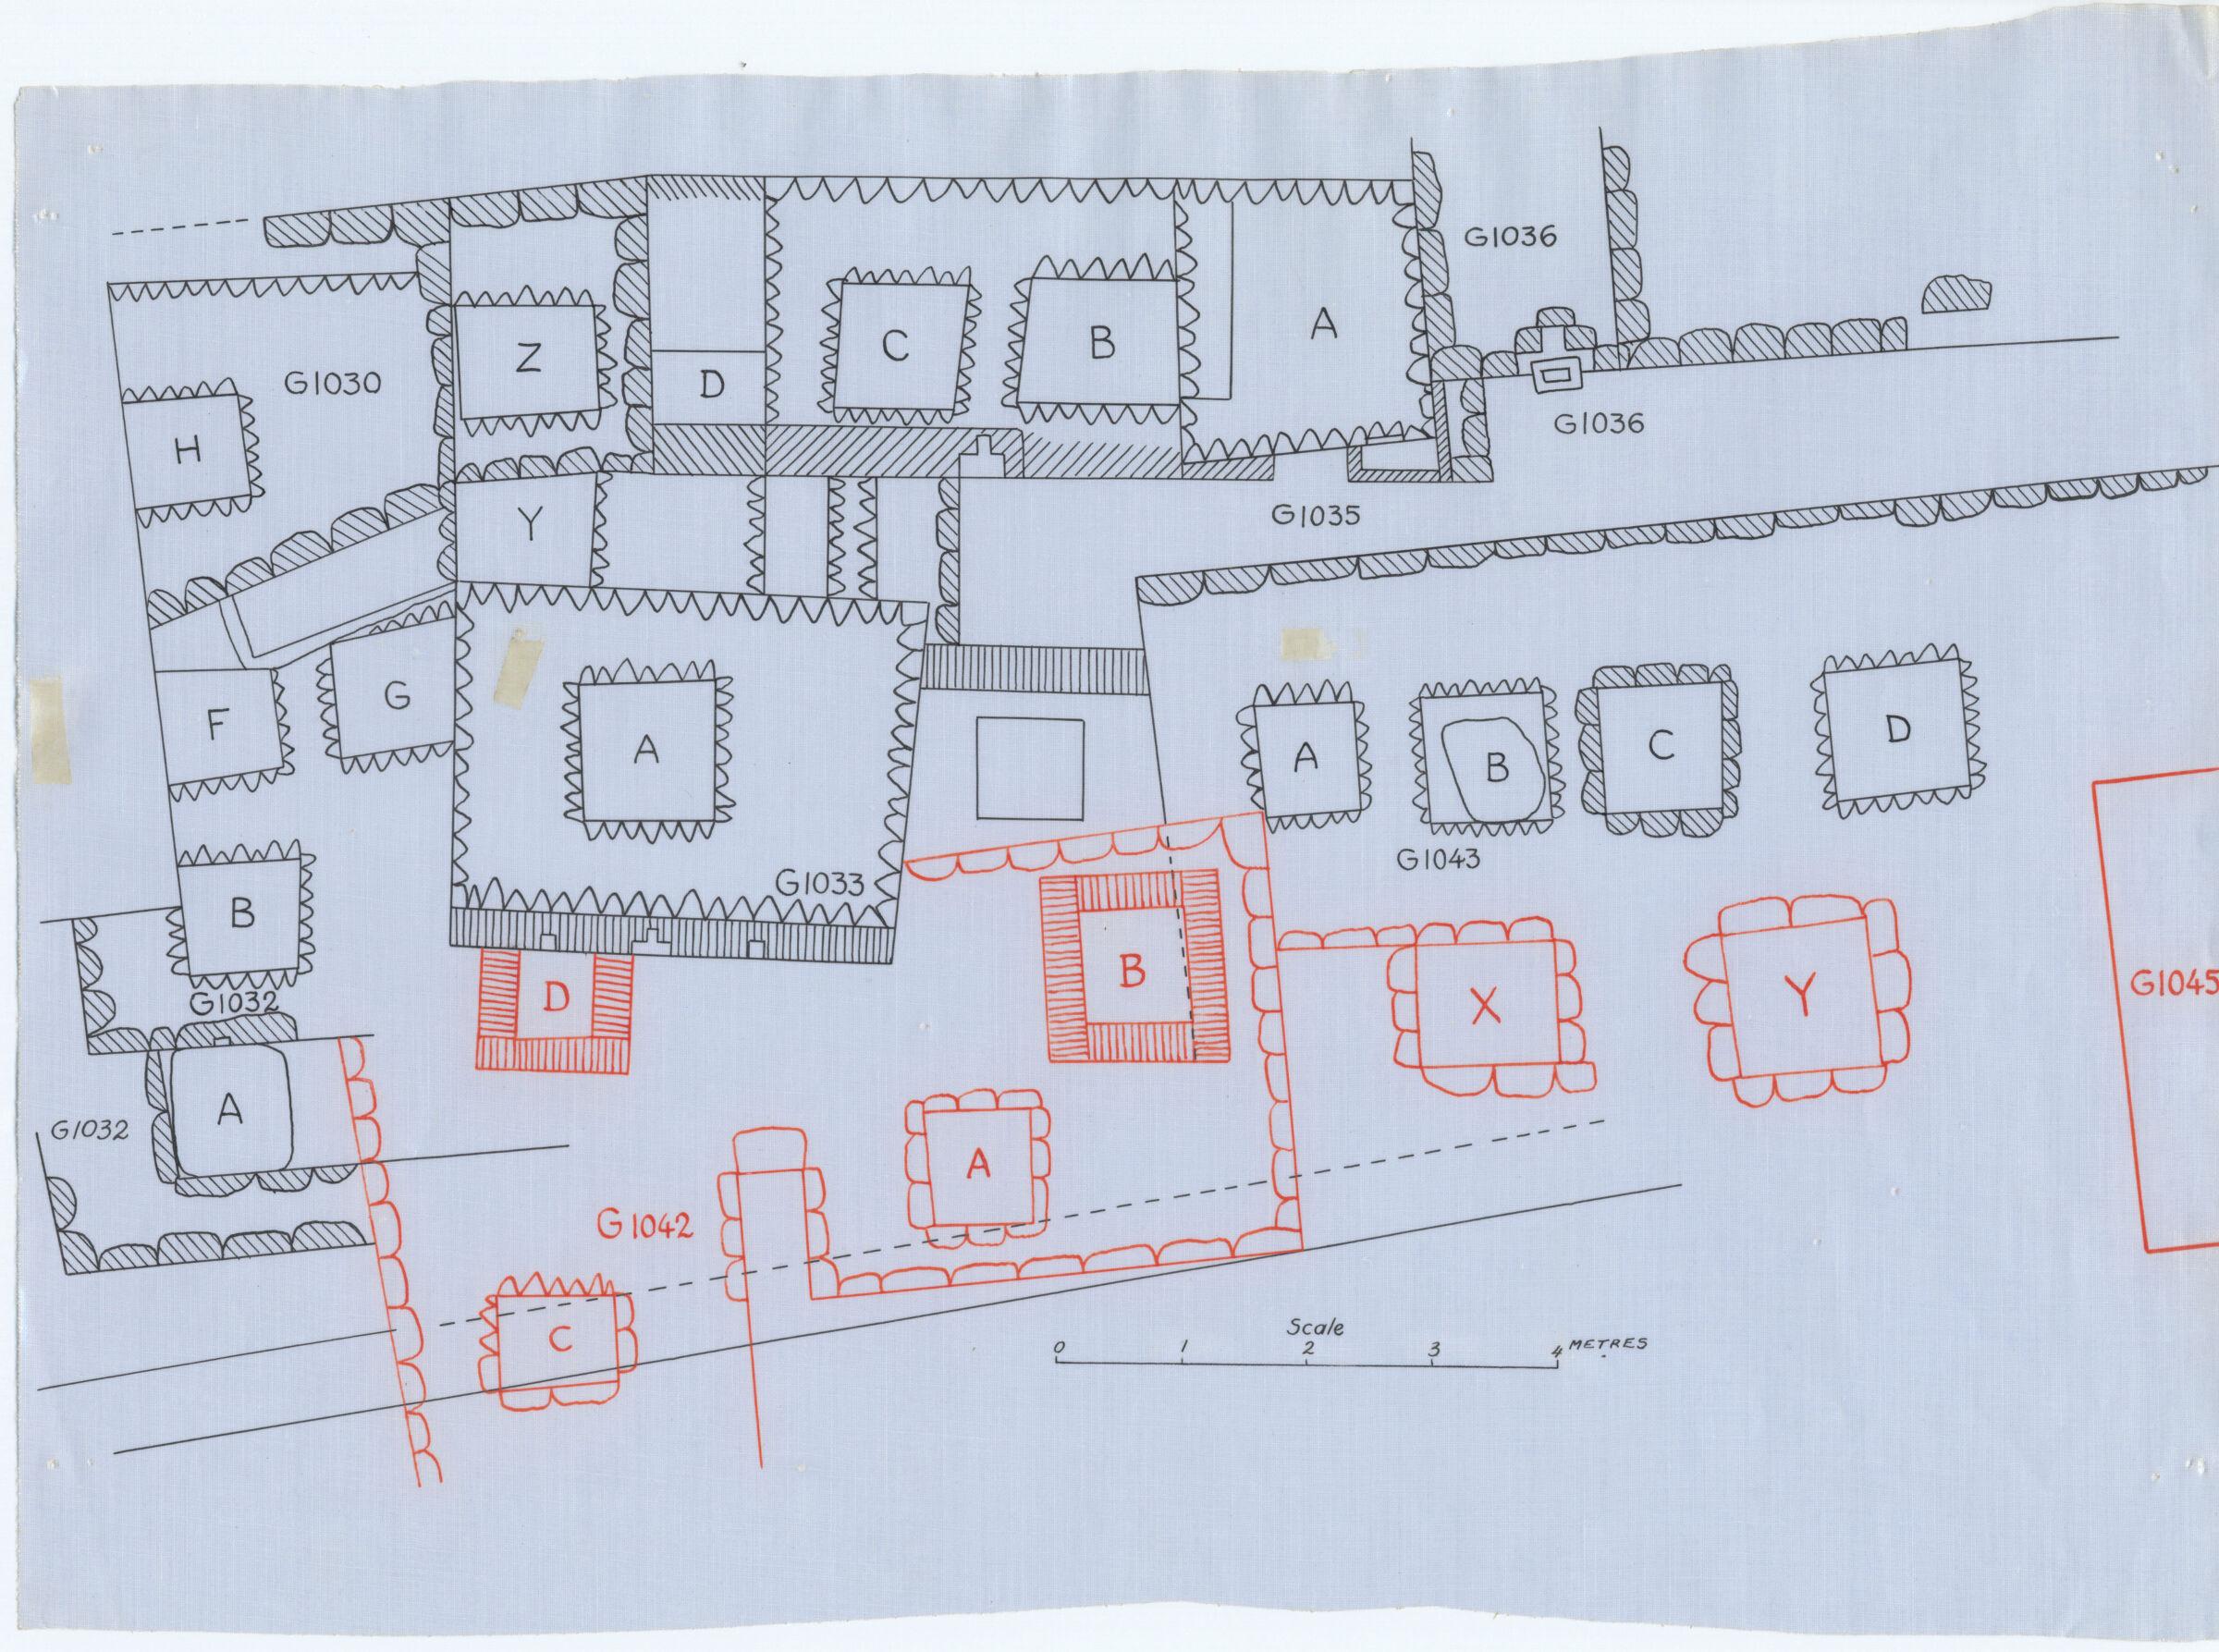 Maps and plans: Plan of G 1030, G 1032, G 1033+1033a, G 1035, G 1036, G 1042, G 1043